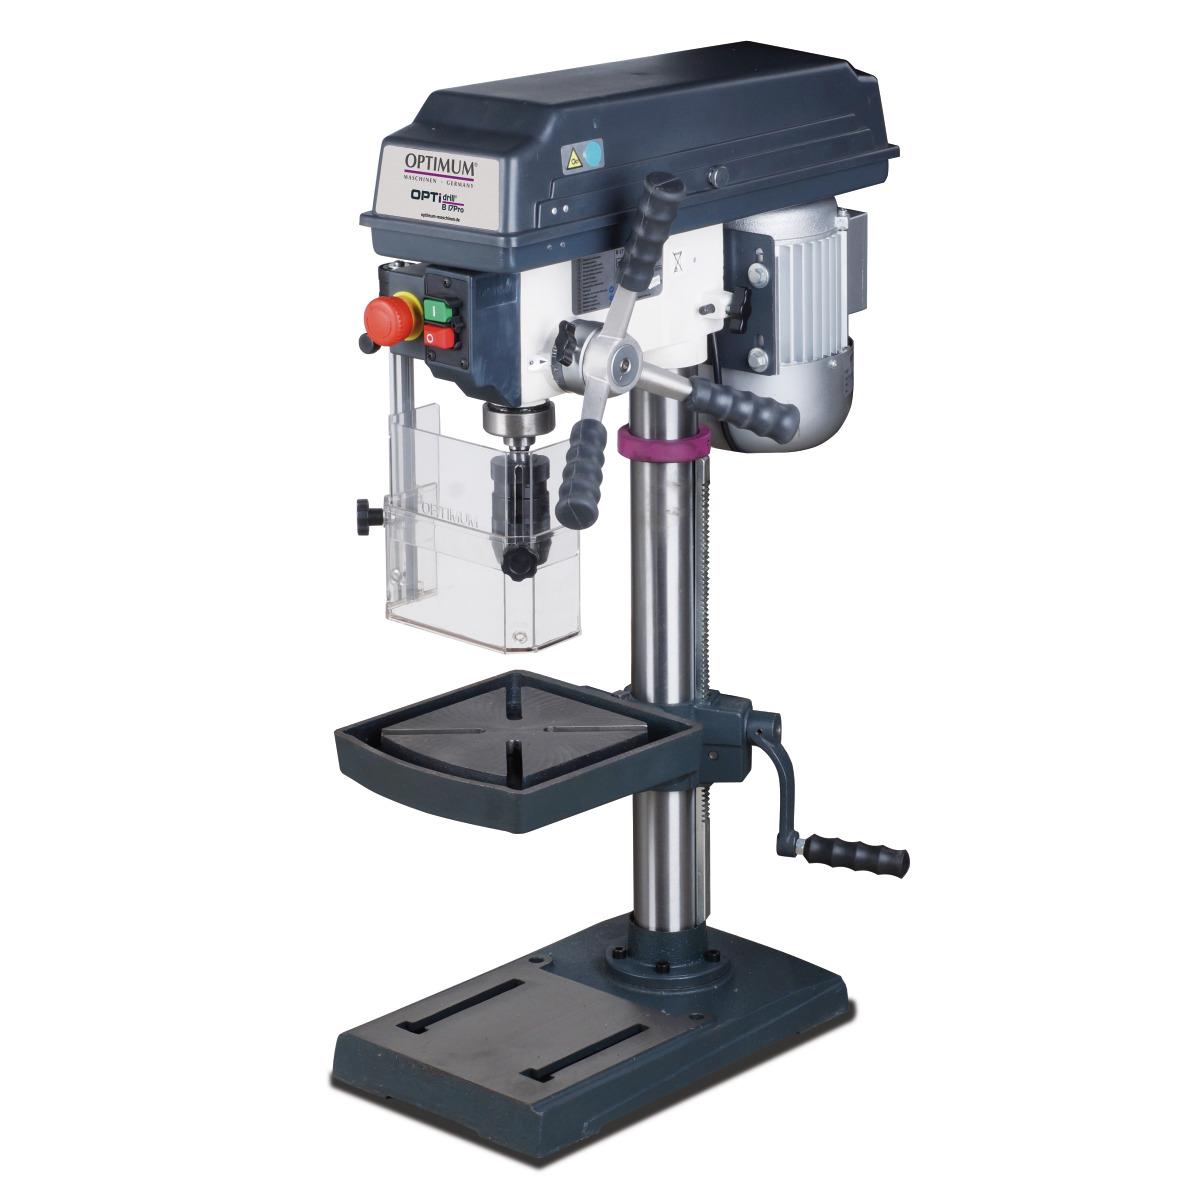 tischbohrmaschine opti drill b17 pro 500w 230v 3003171 dittmar werkzeuge. Black Bedroom Furniture Sets. Home Design Ideas